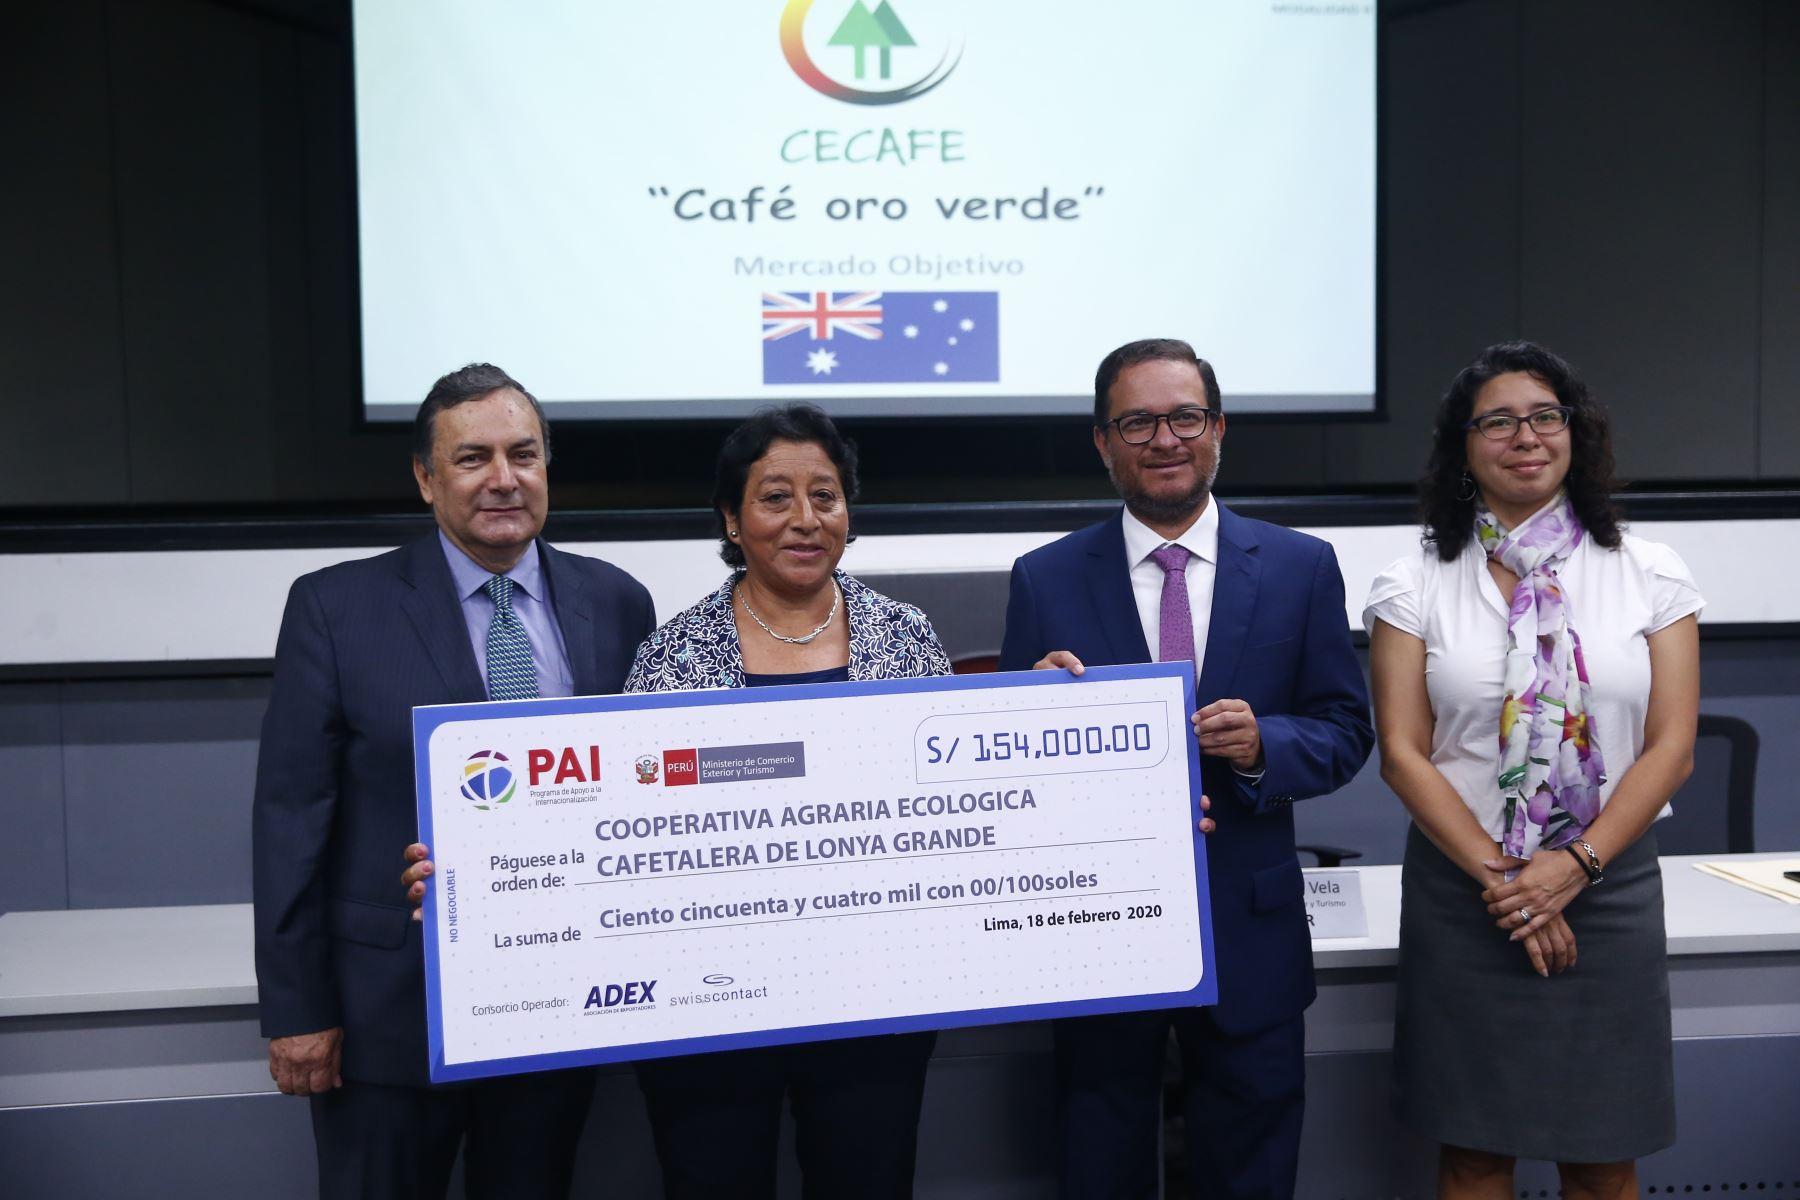 La Cooperativa Agraria Ecológica Cafetalera de Lonya Grande recibe un cheque por 154 mil soles. Foto: ANDINA/Jhonel Rodríguez Robles